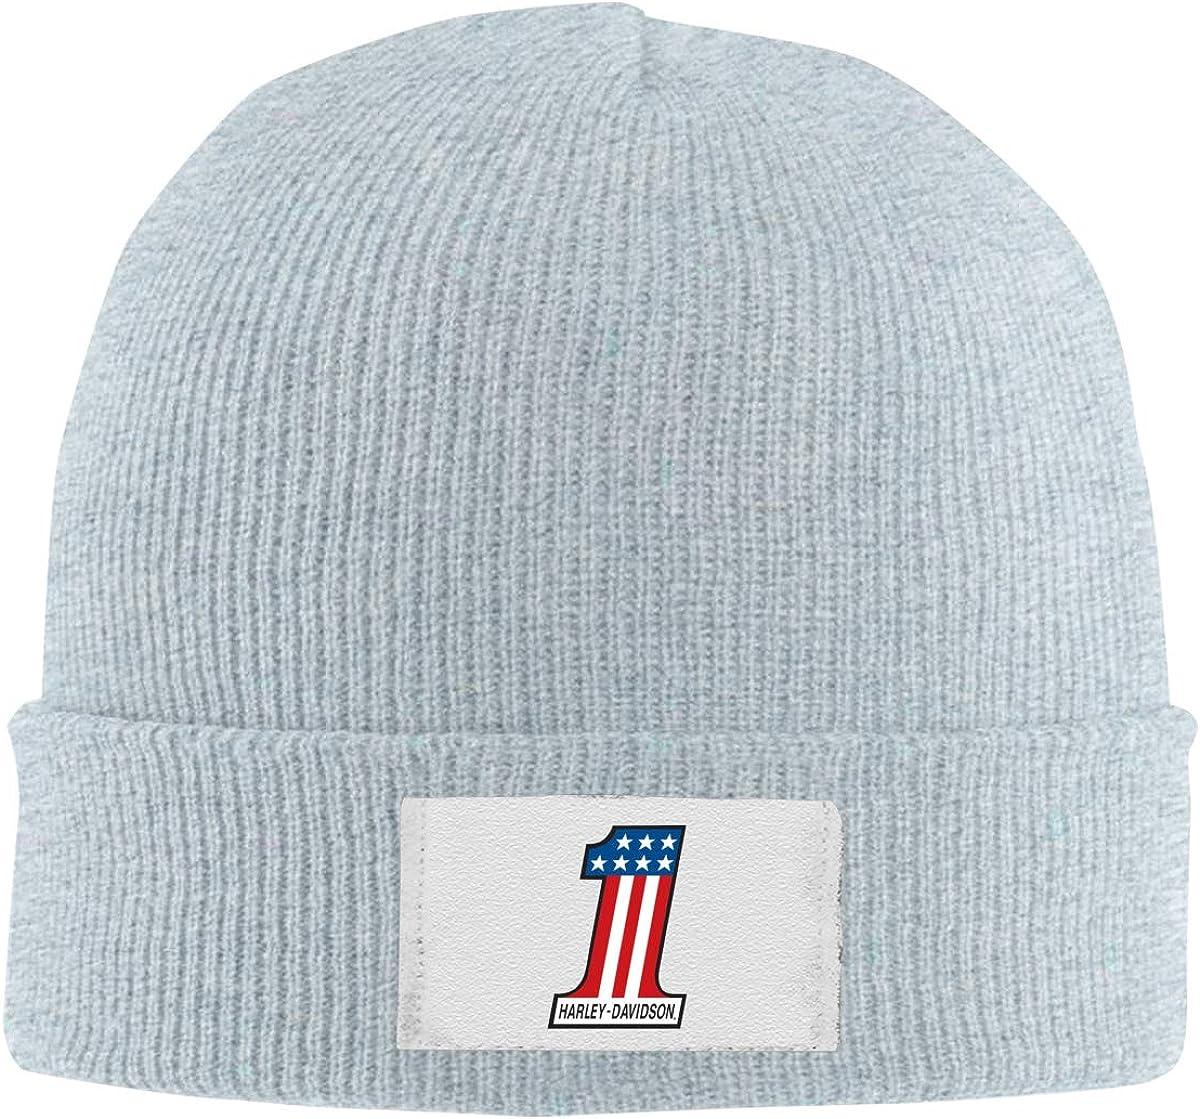 One Logo Knitted Hat Winter Outdoor Hat Warm Beanie Caps for Men Women